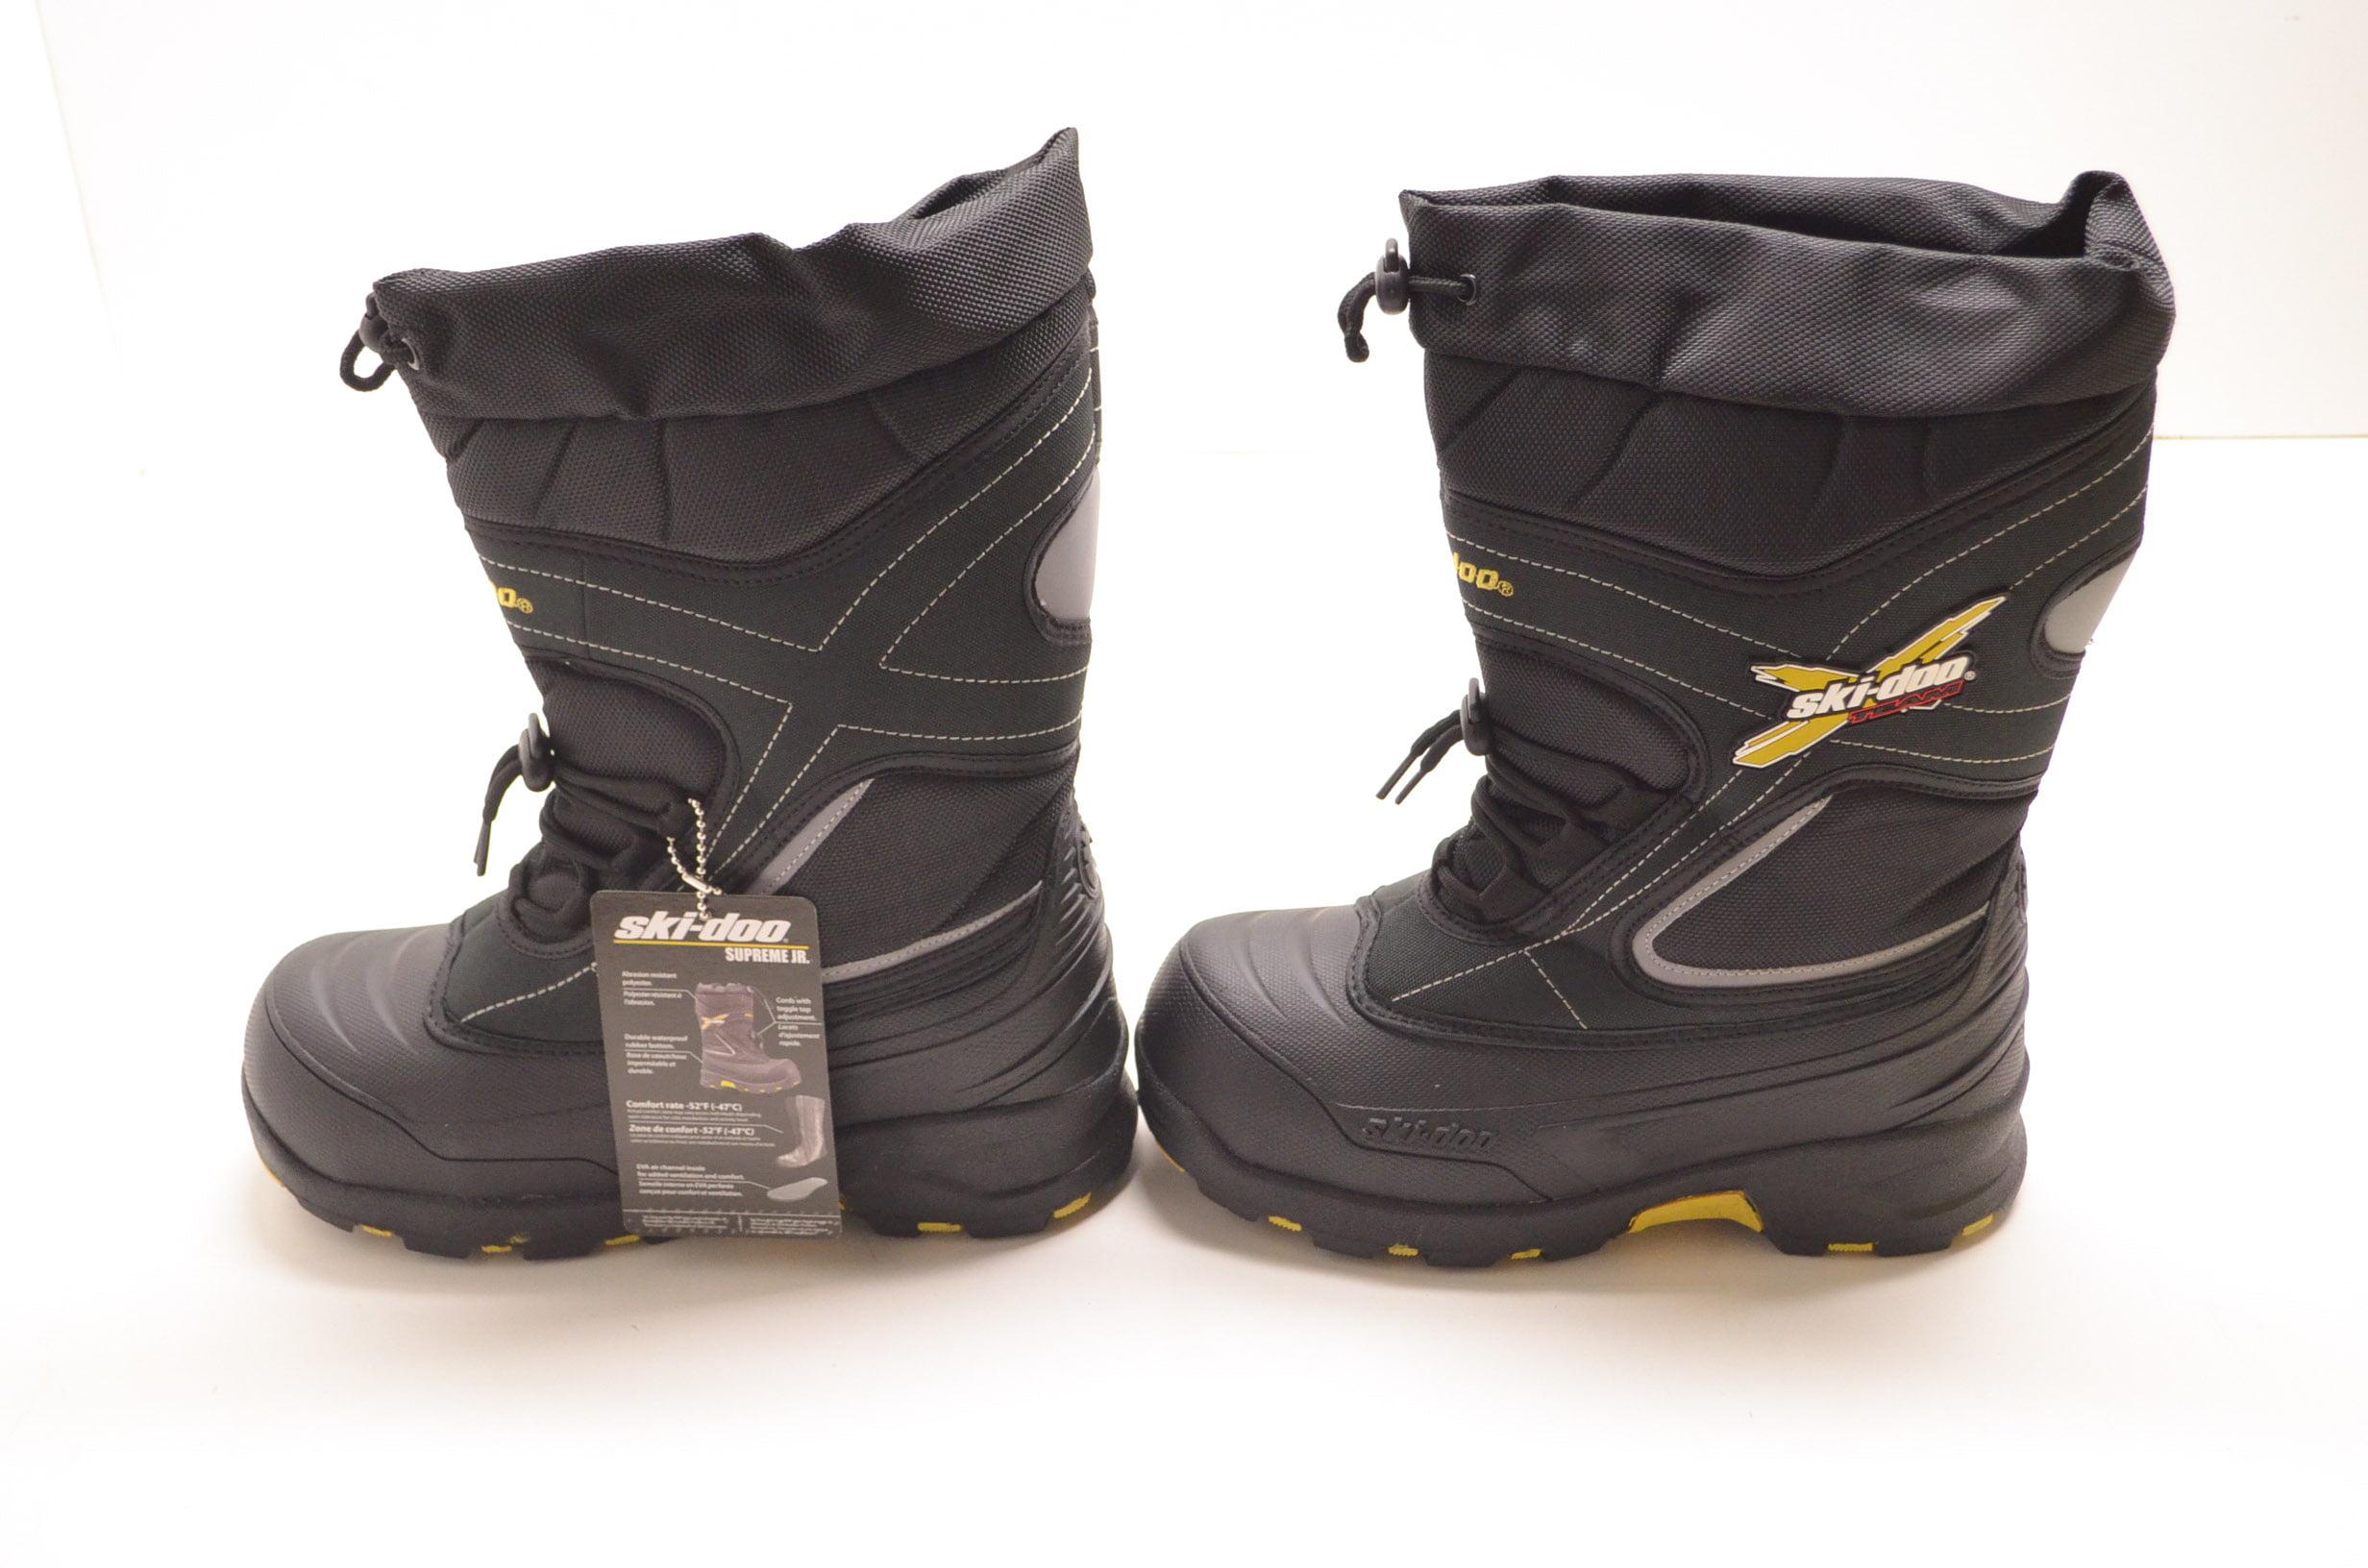 Ski-Doo 4441942390 X Team Boot Size 4 QTY 1 by Ski-Doo